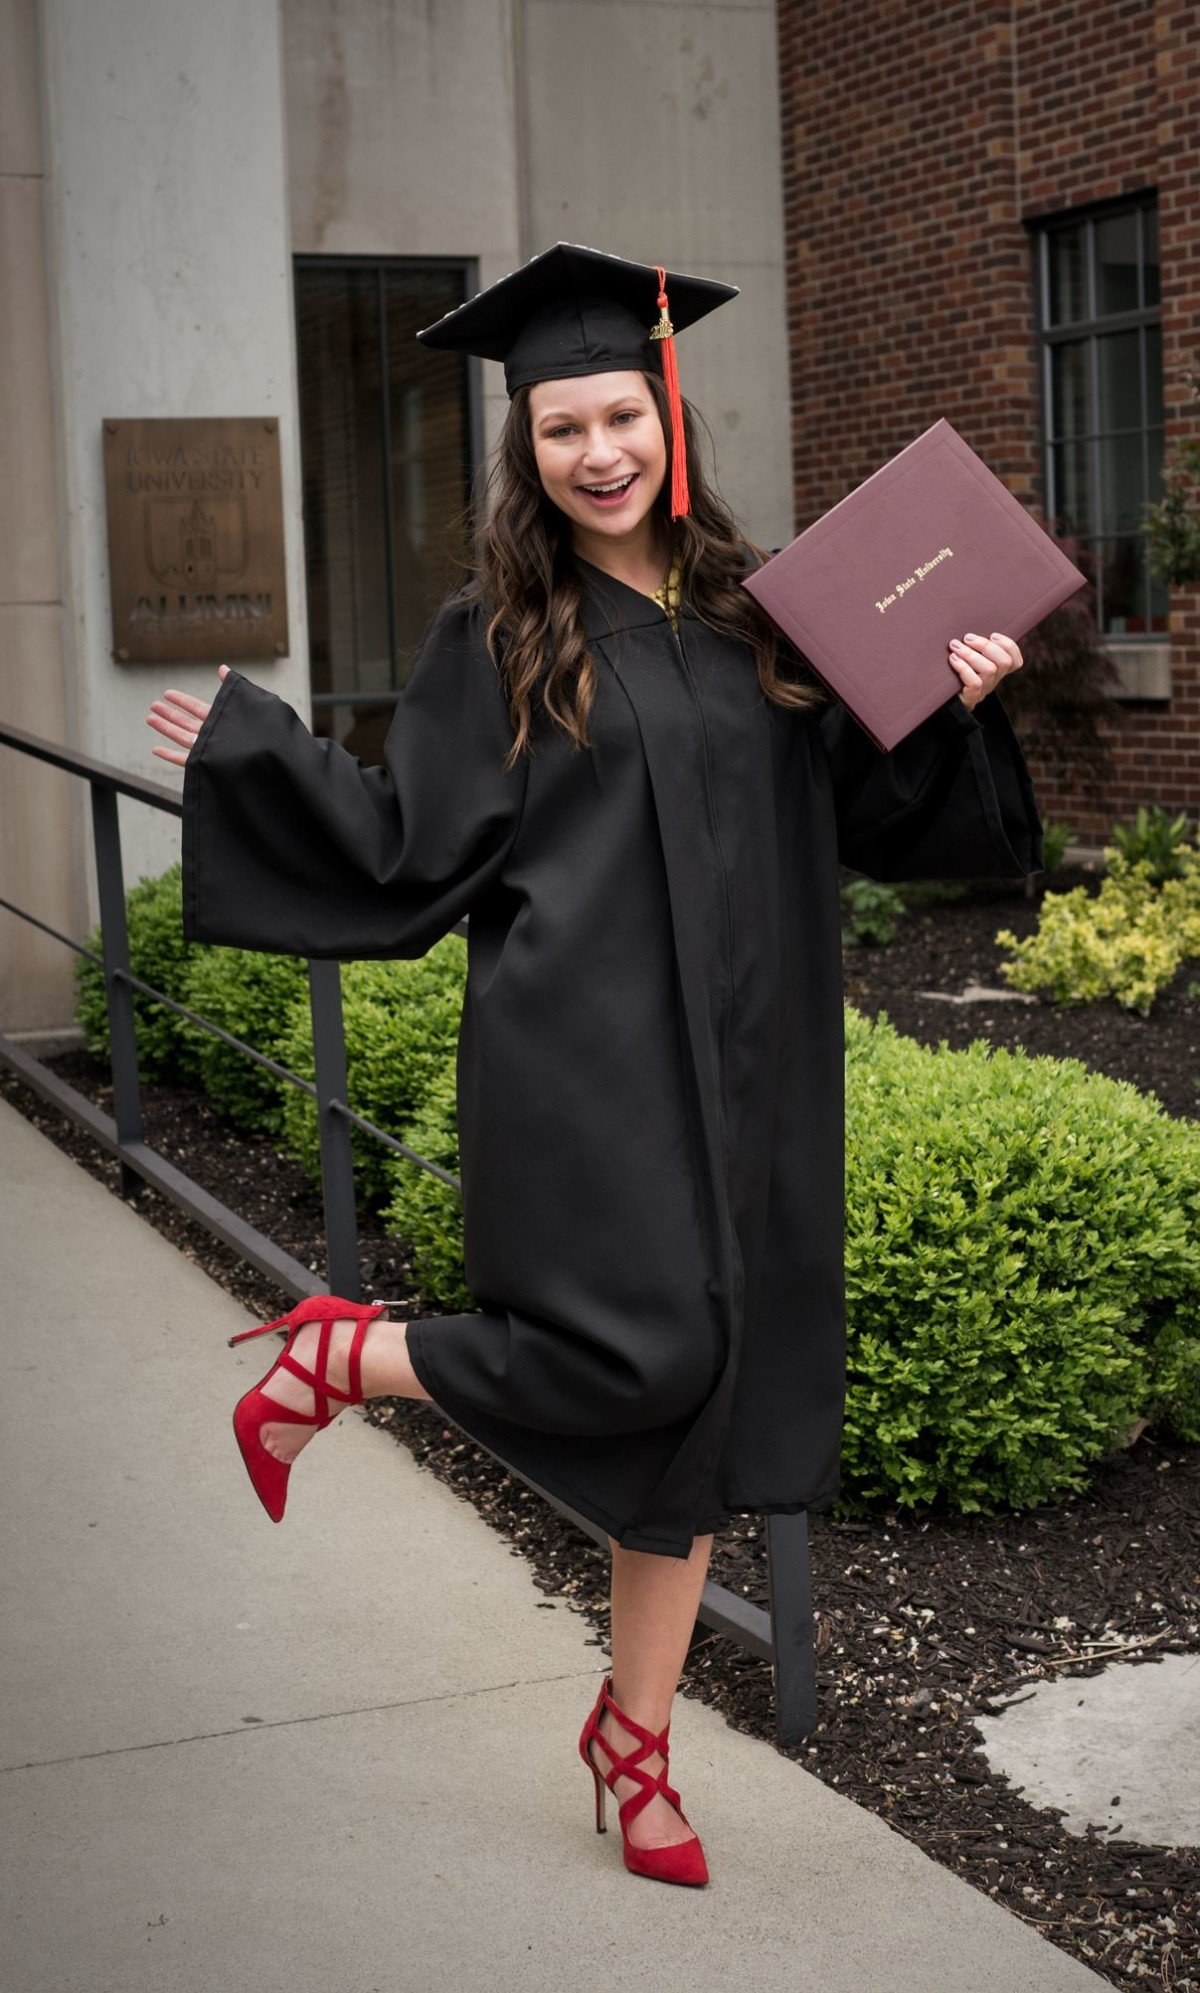 Graduation | Electrical Engineering | Iowa State University | hayle santella | www.haylesantella.com